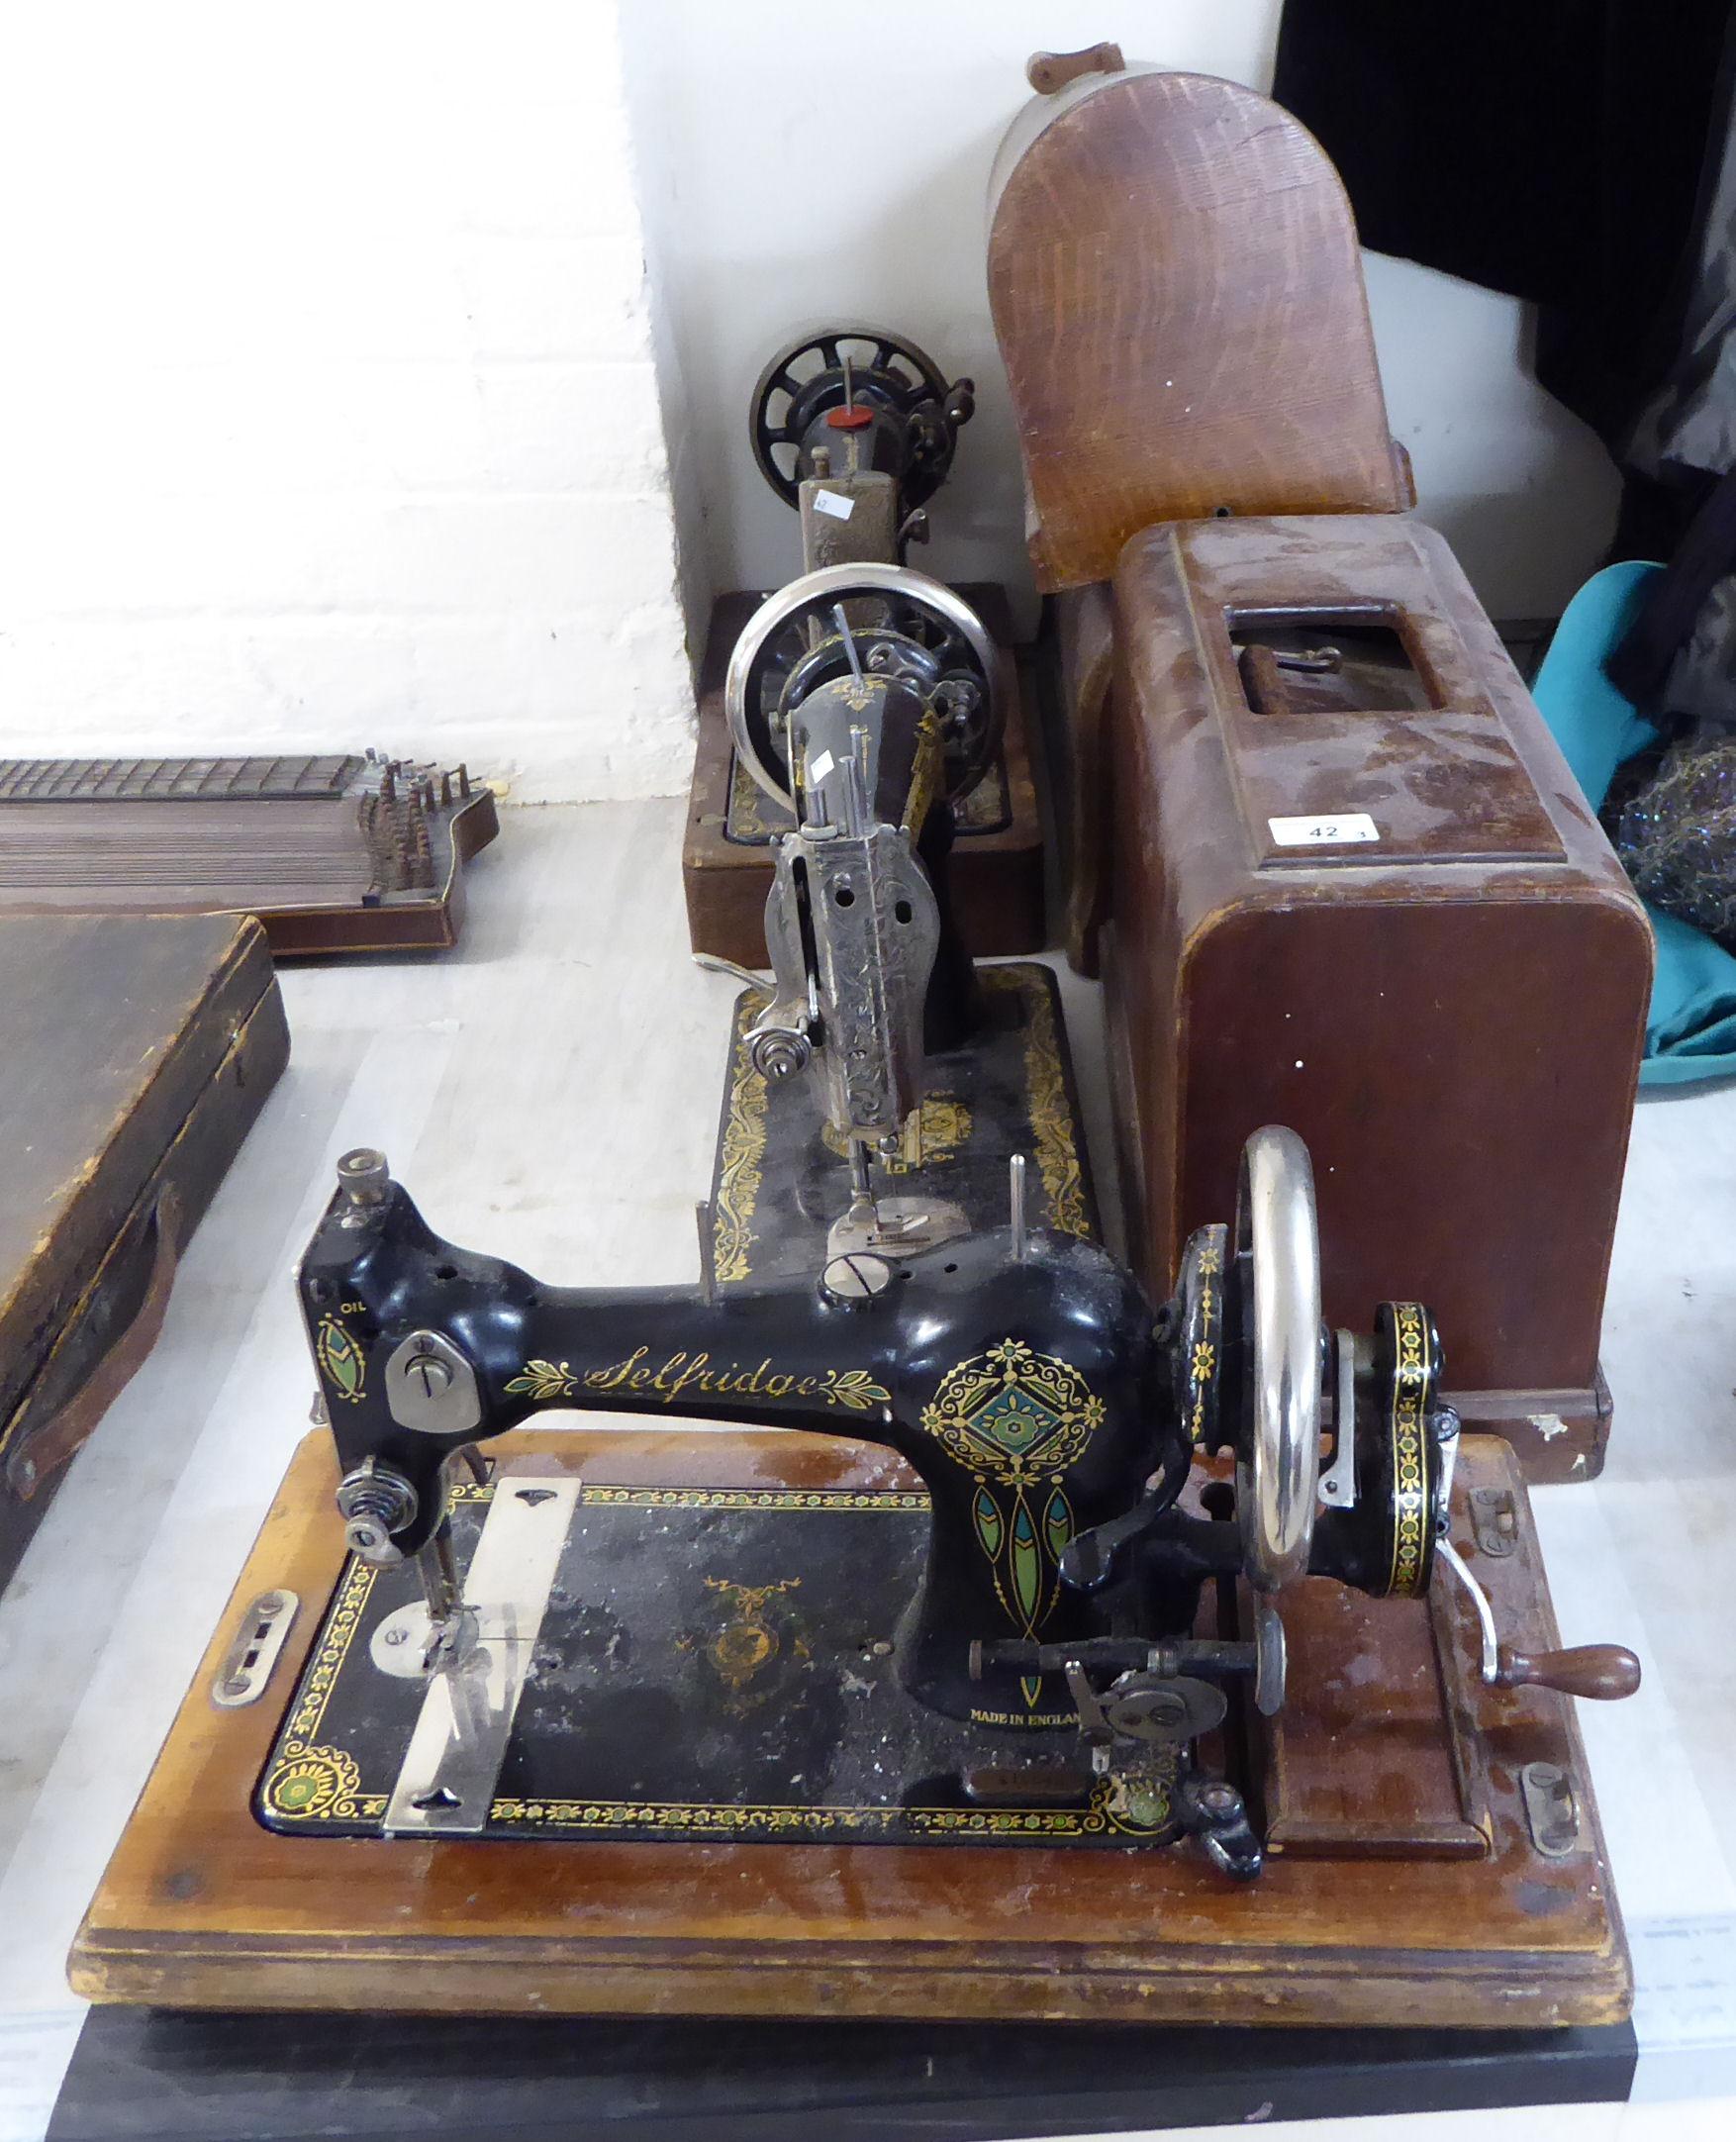 Lot 42 - Two similar manual Singer sewing machines, model no.